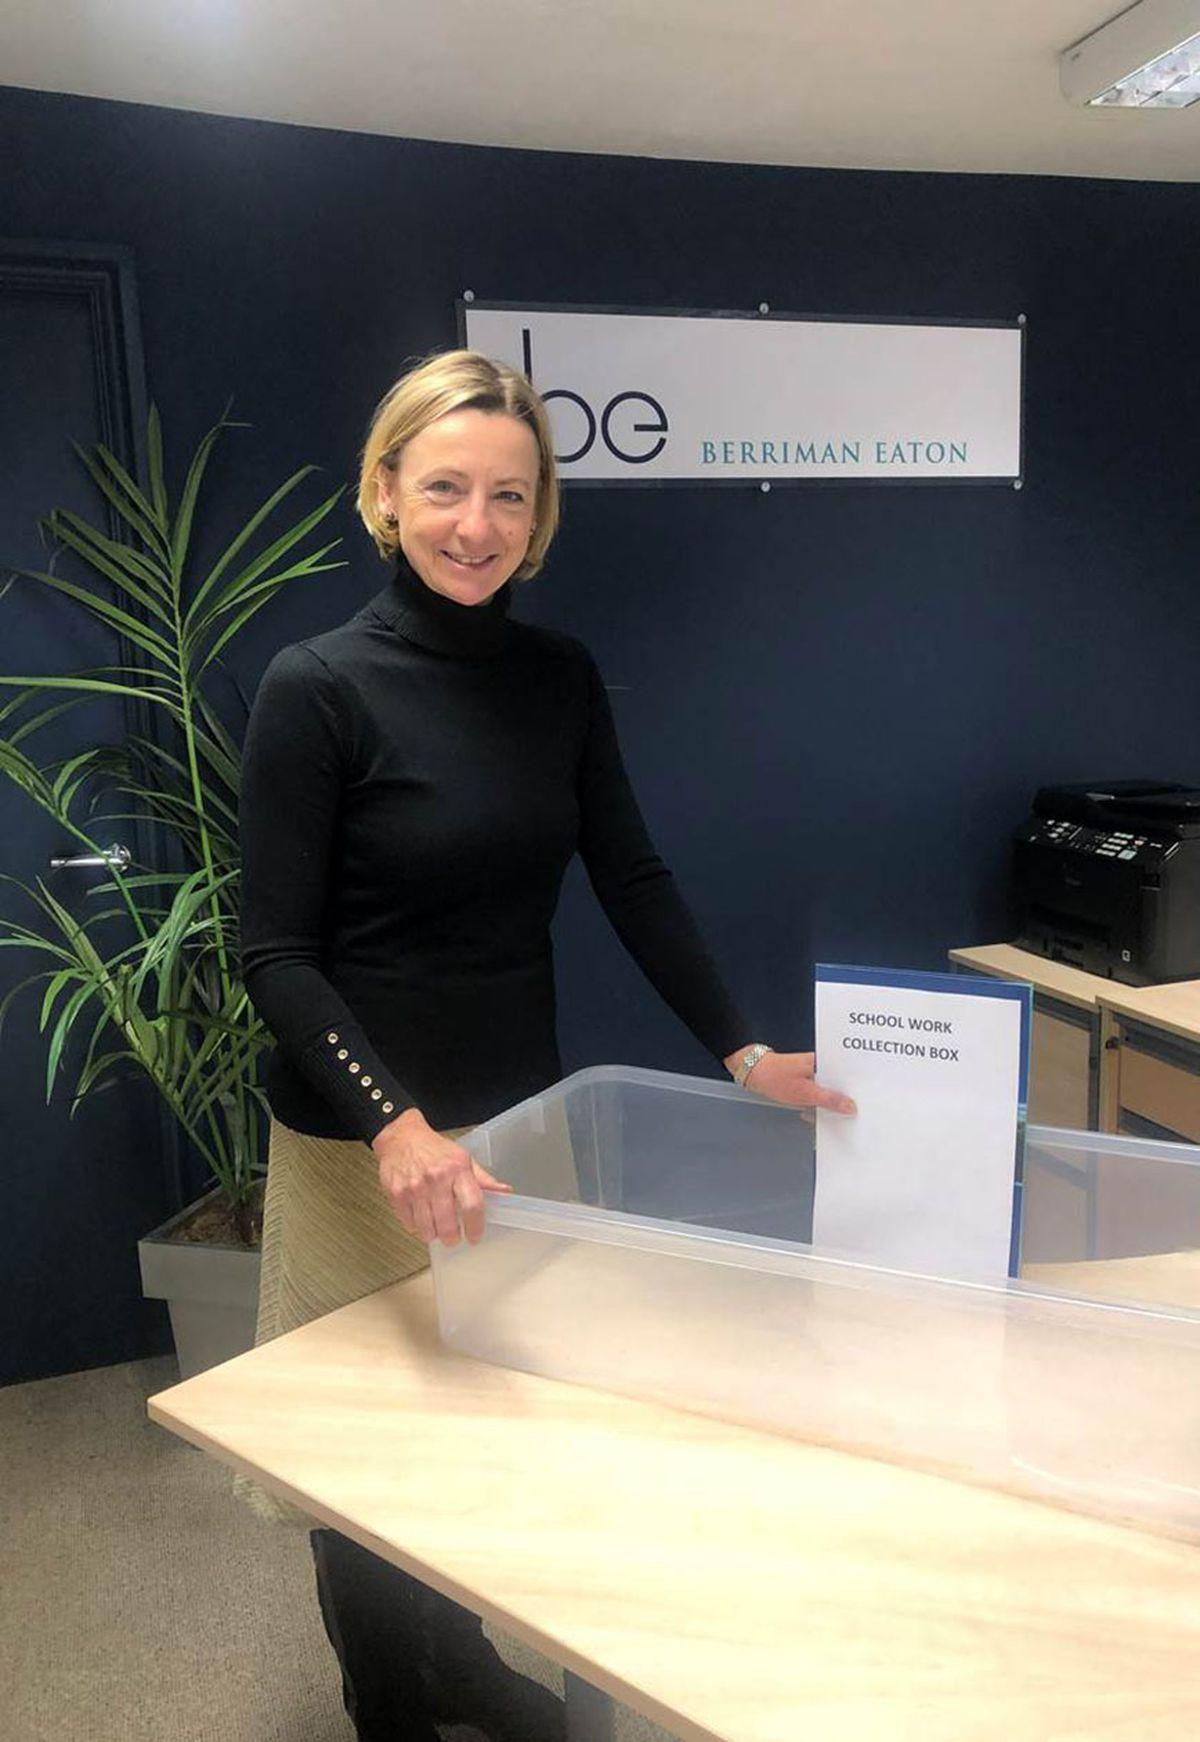 Caroline Eaton, director of Berriman Eaton